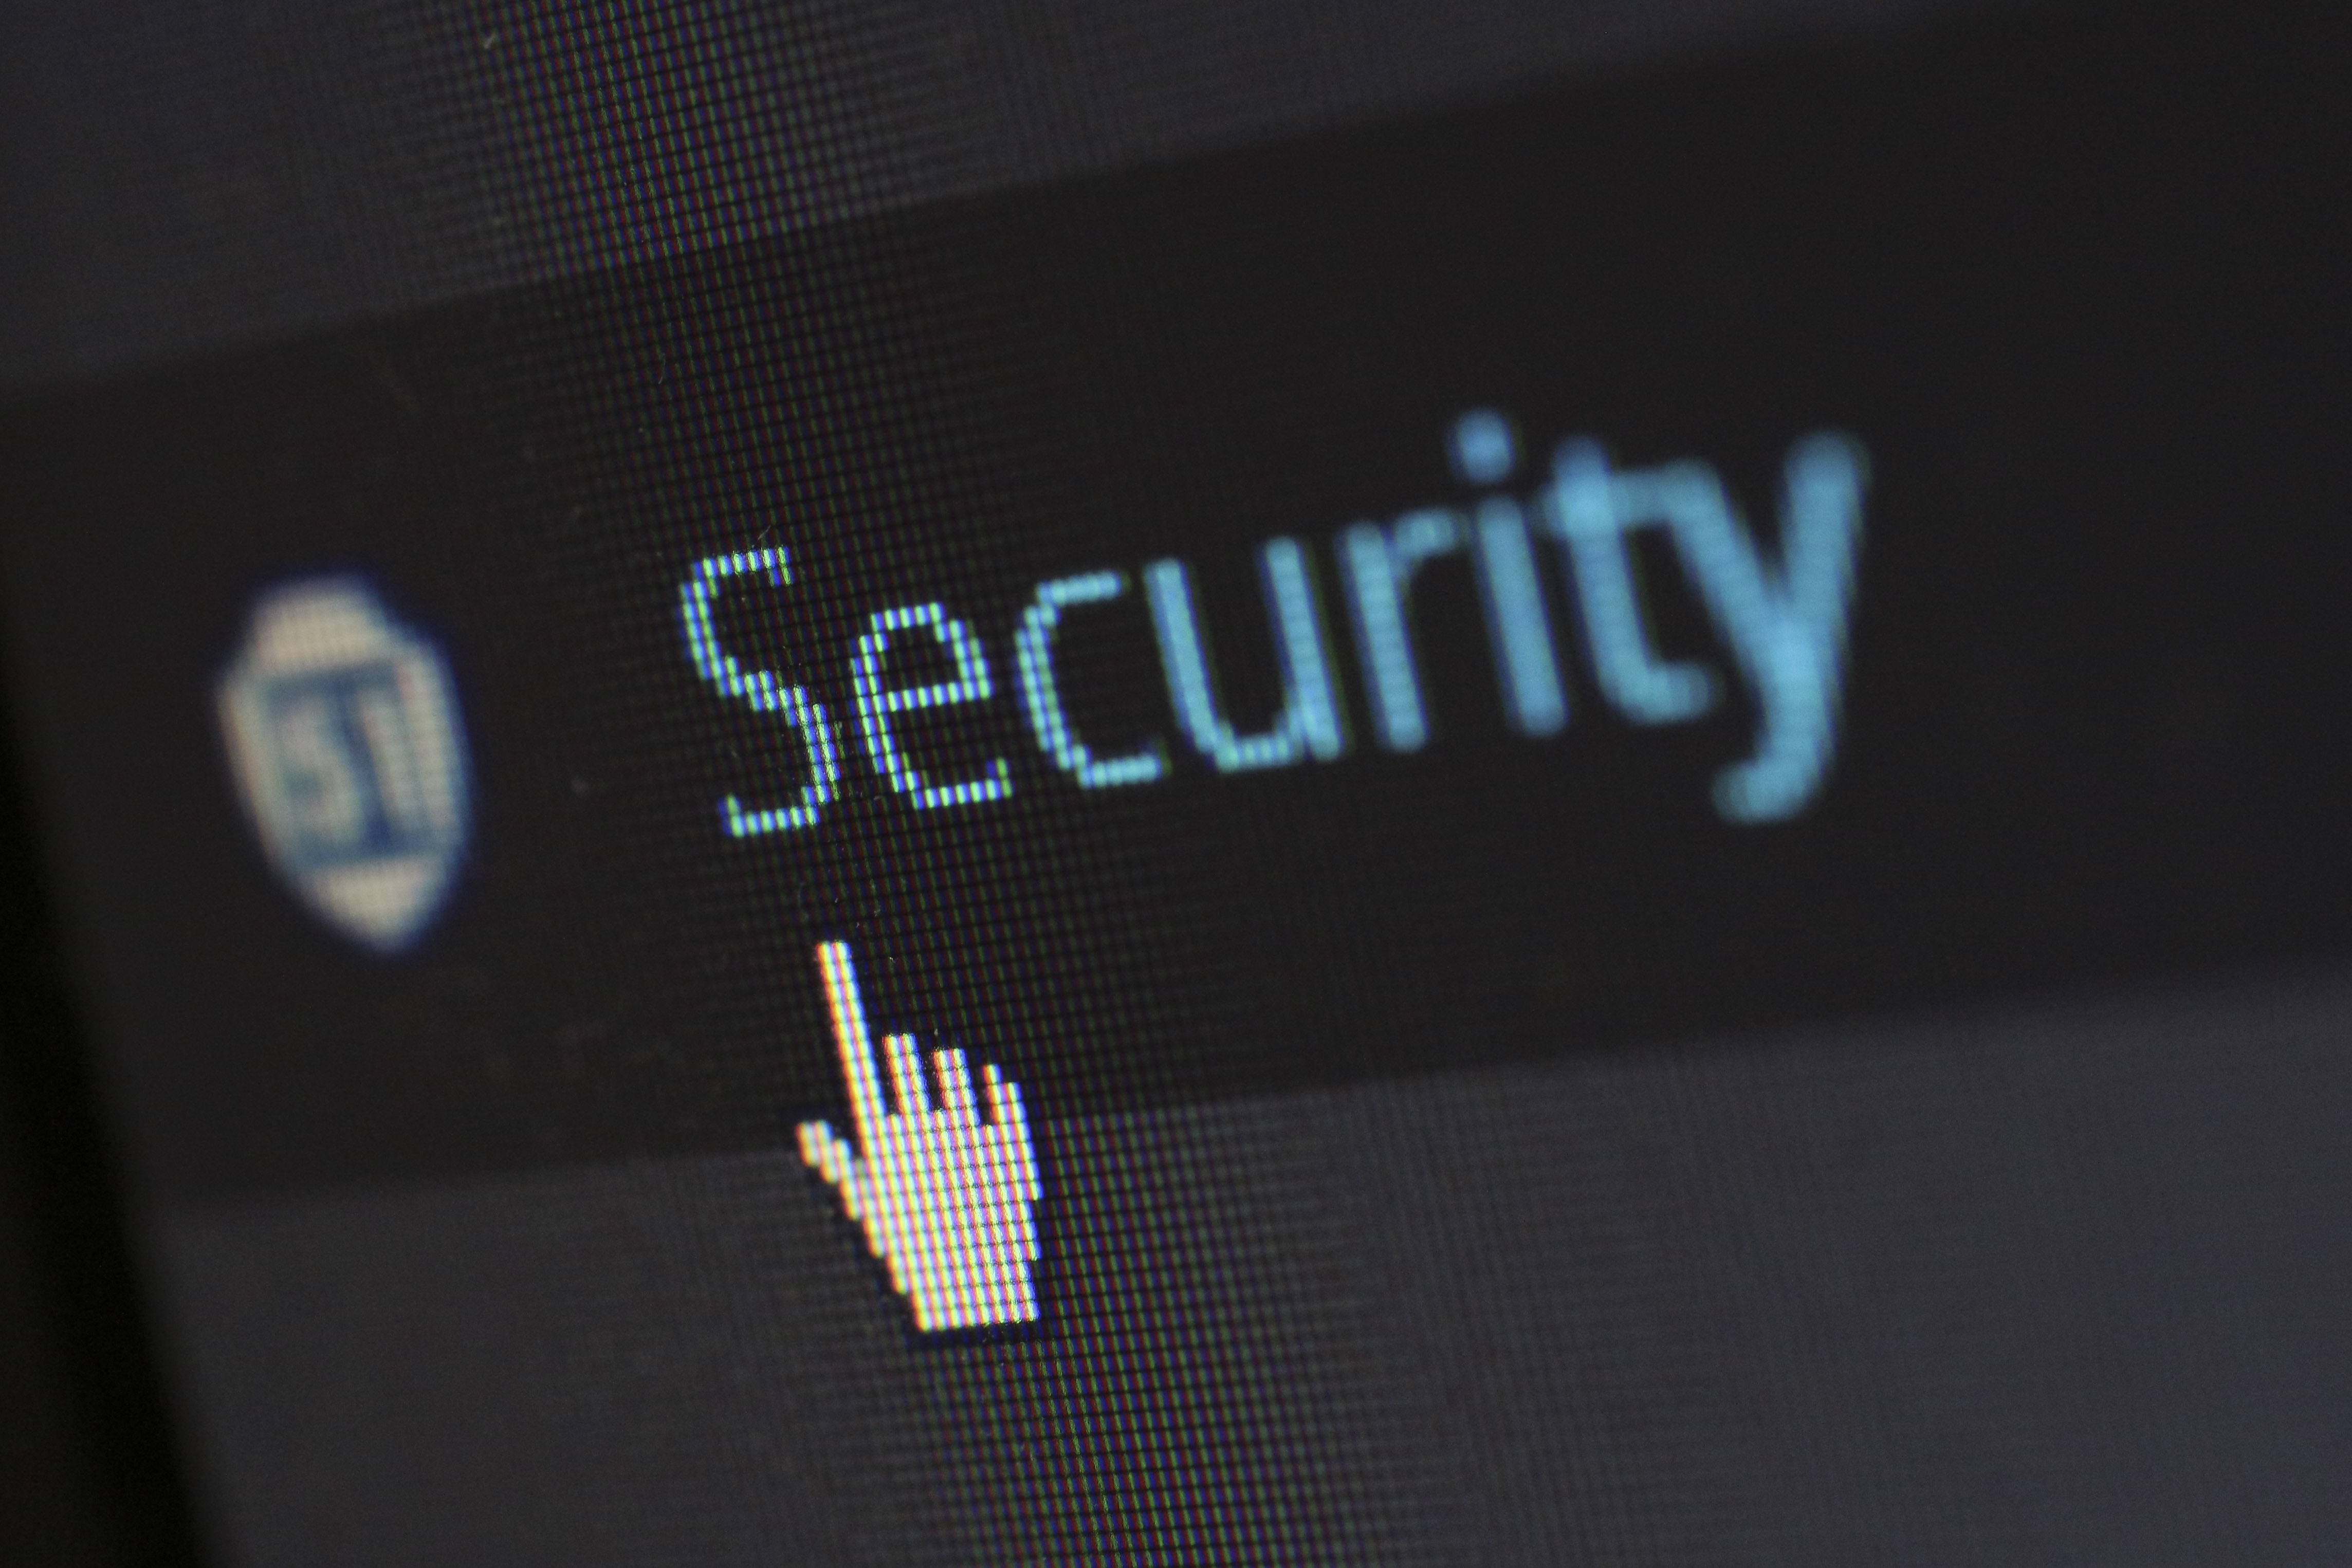 security-protection-anti-virus-software-60504.jpeg